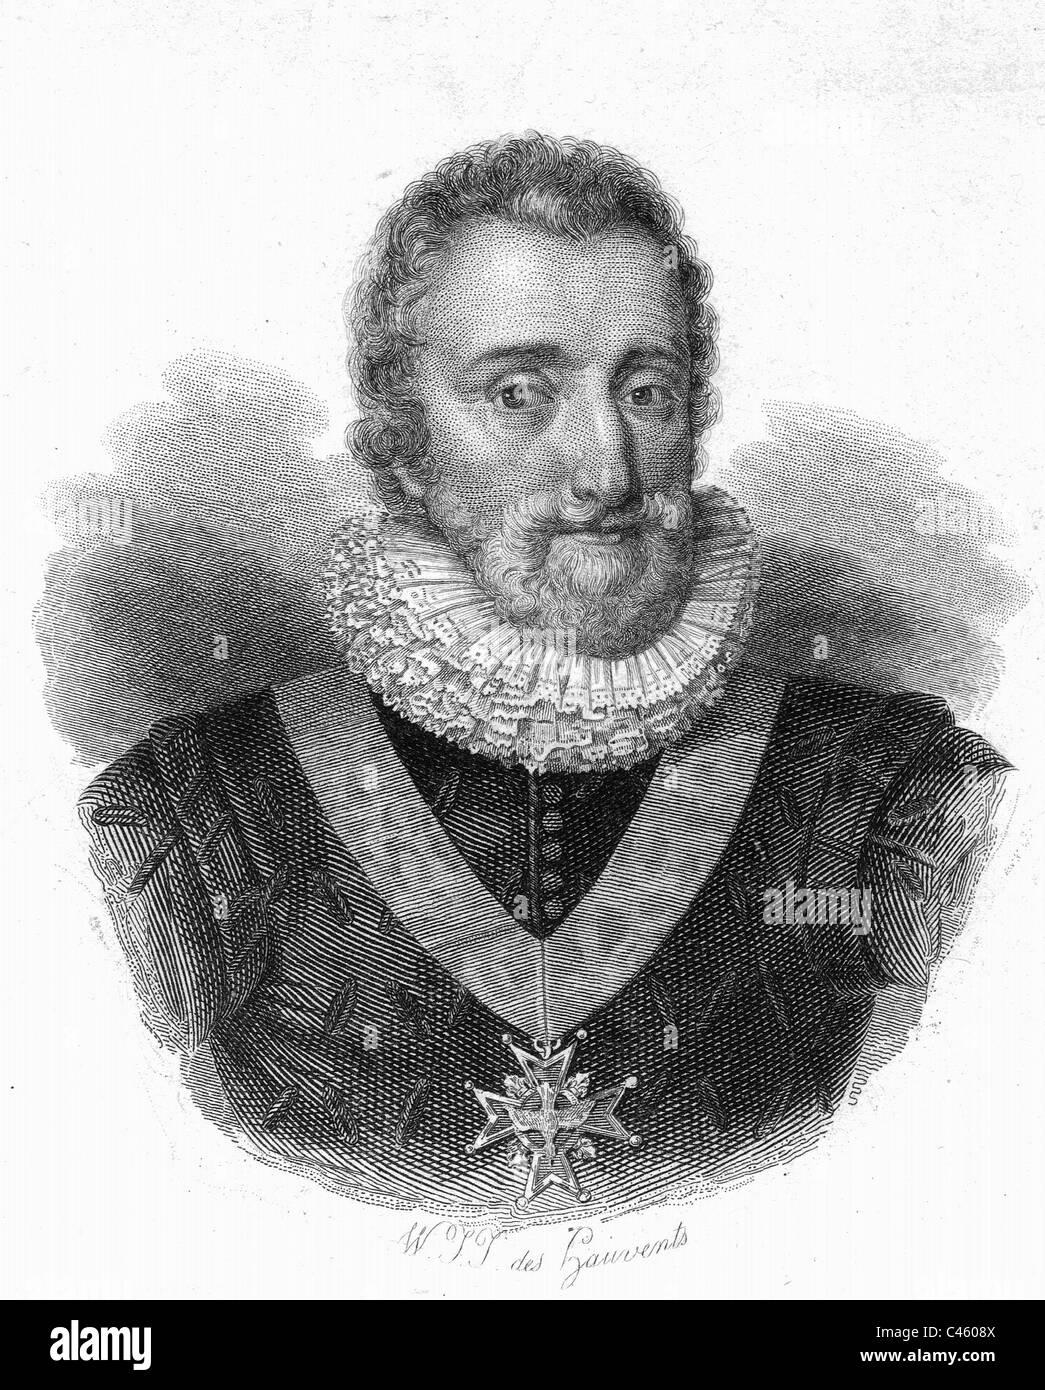 Henry IV, King of France - Stock Image